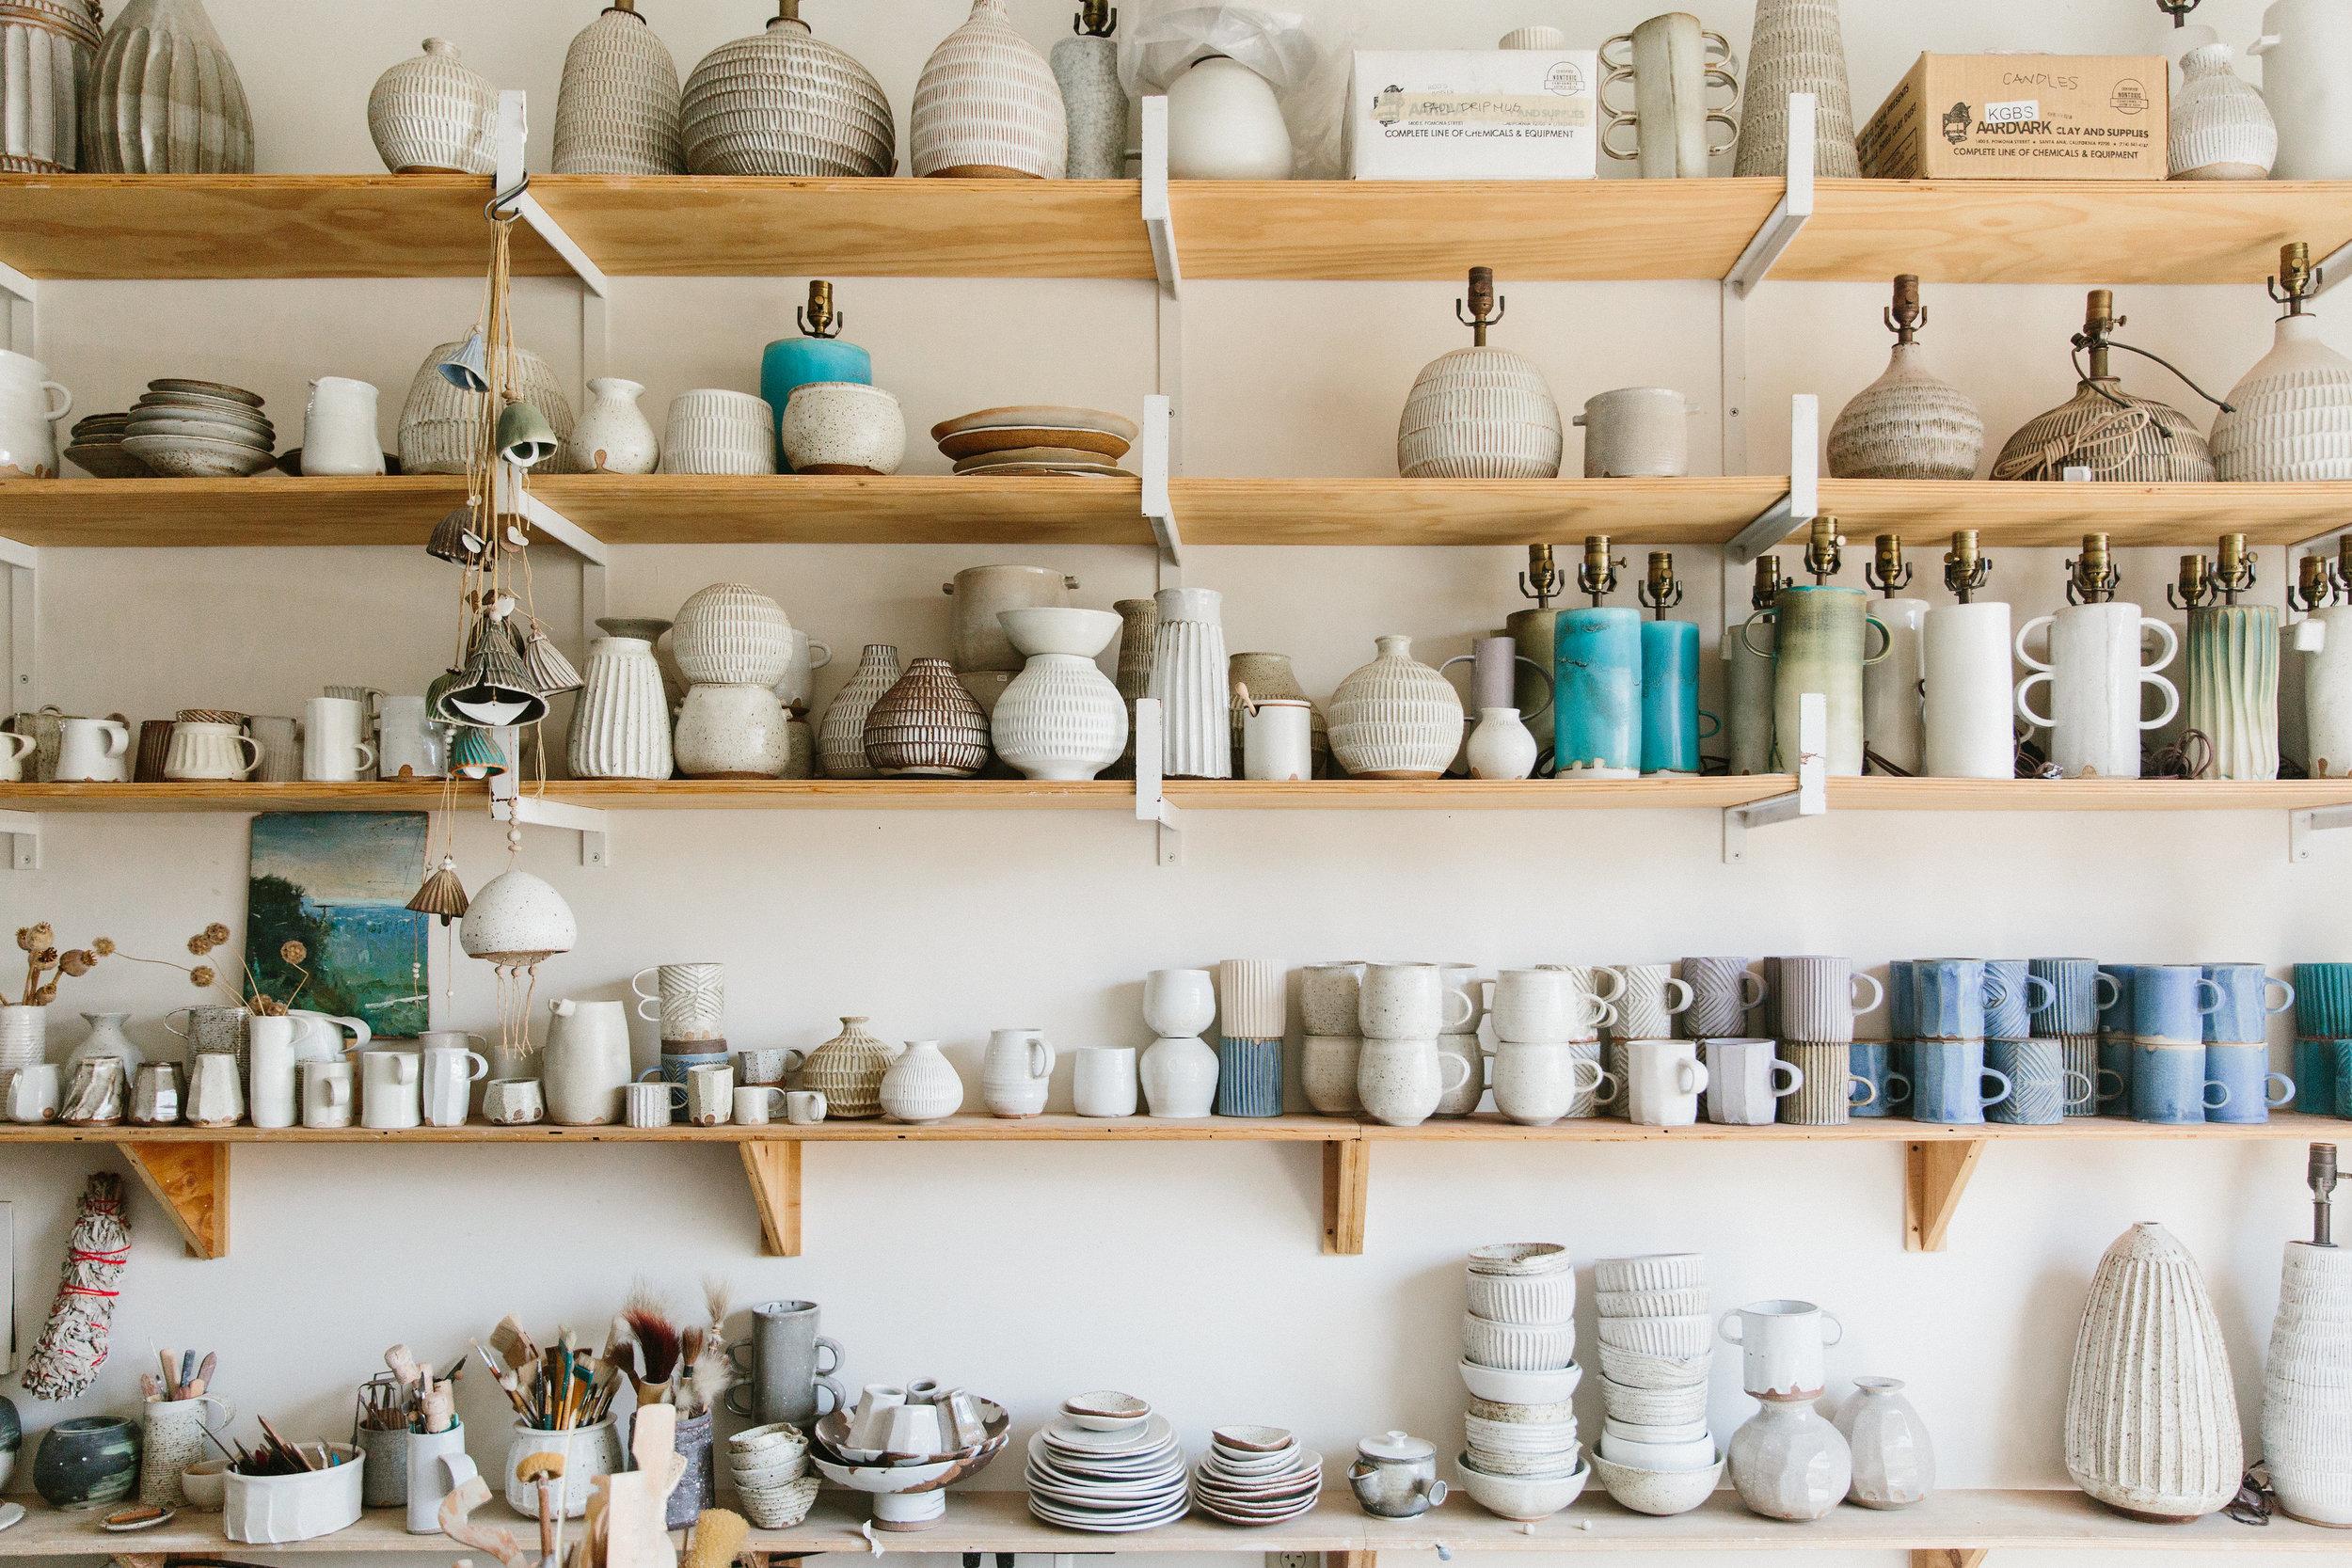 mt-washington-pottery_jenni-kayne_nicki-sebastian-photography-20.jpg